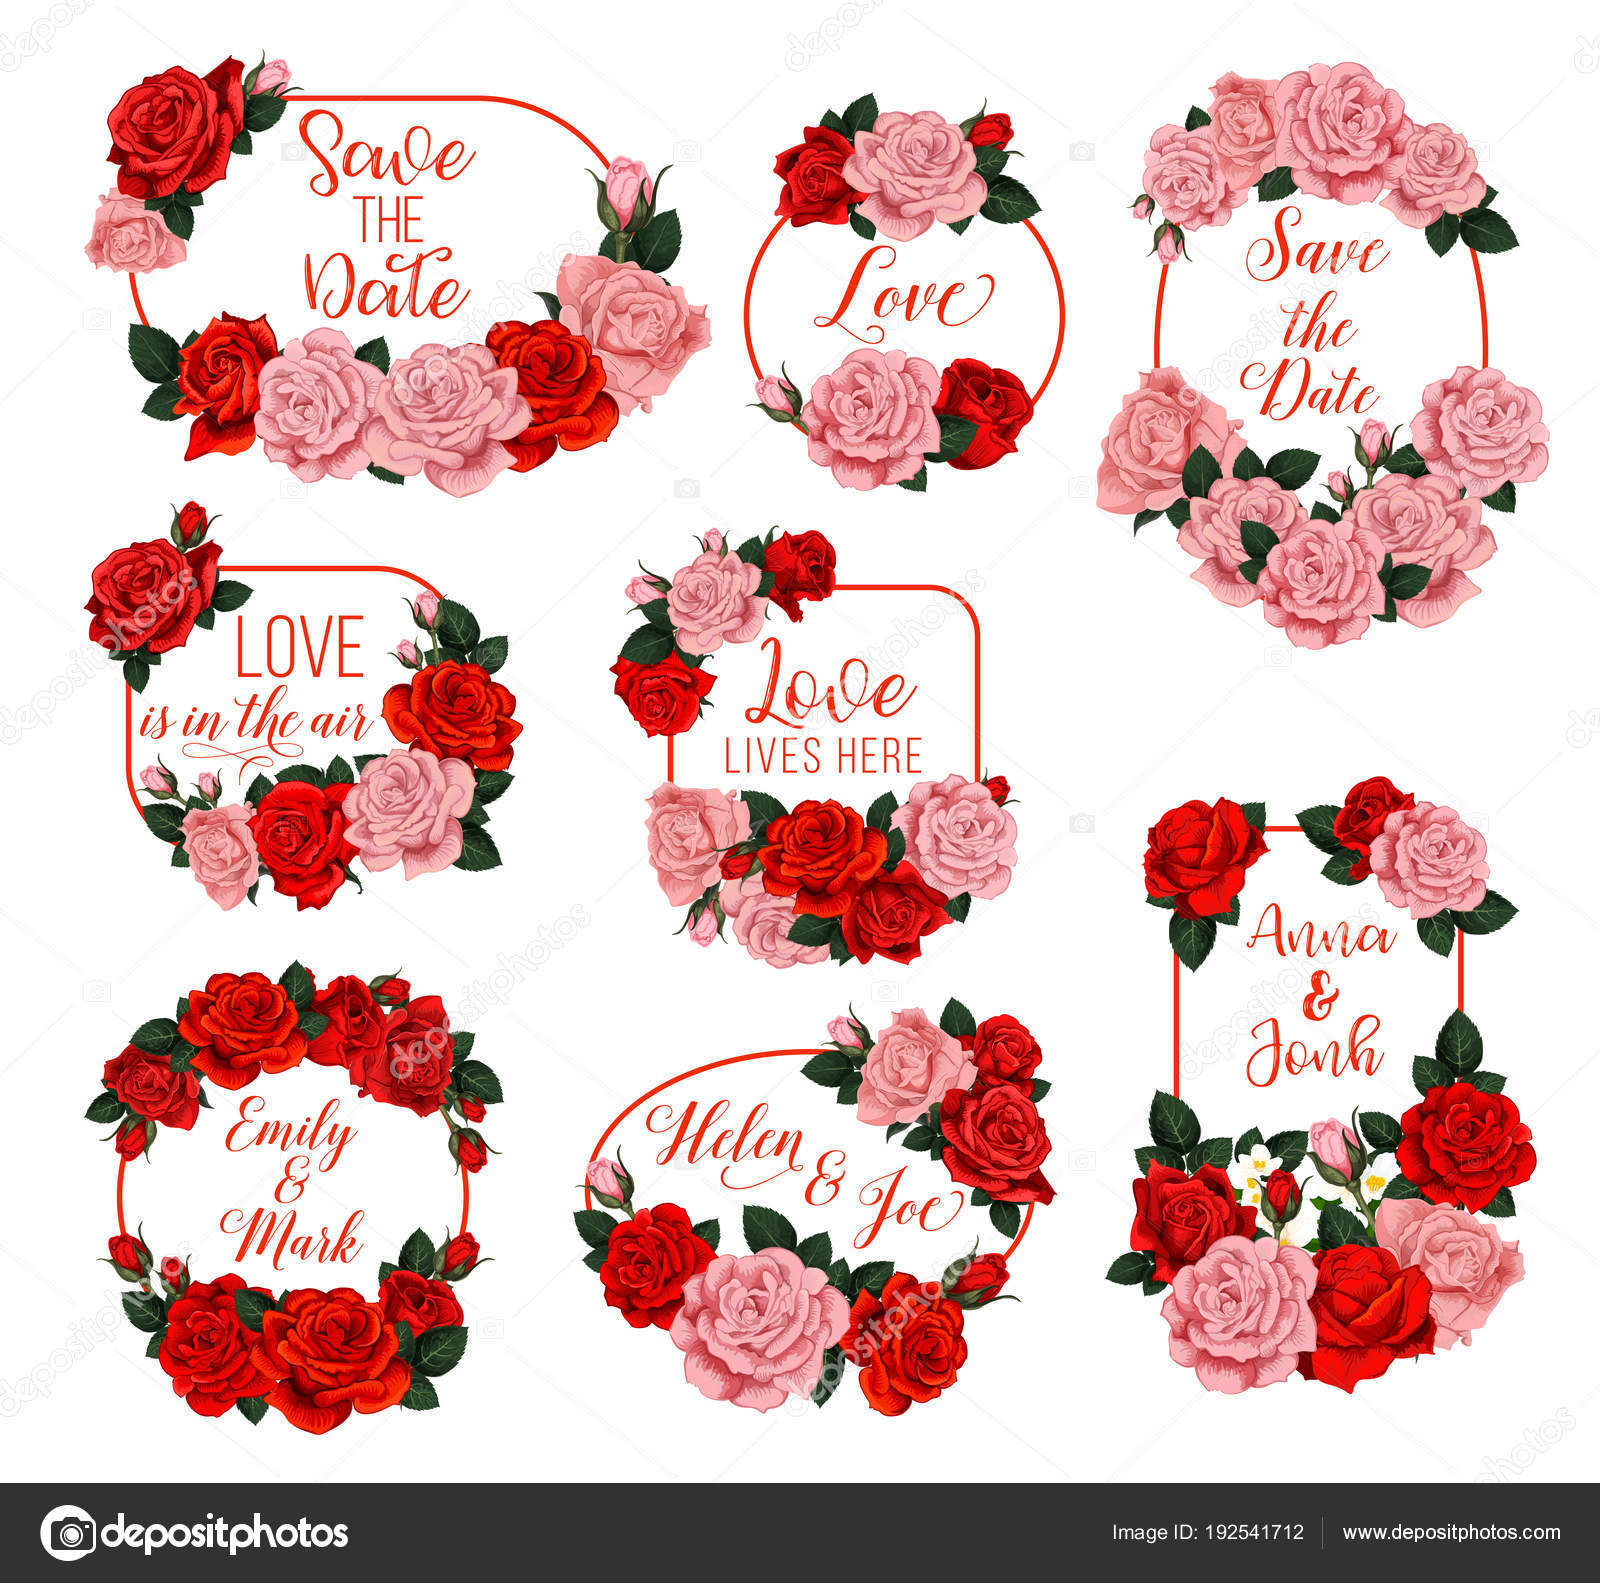 Springtime flowers vector frames for wedding — Stock Vector ...